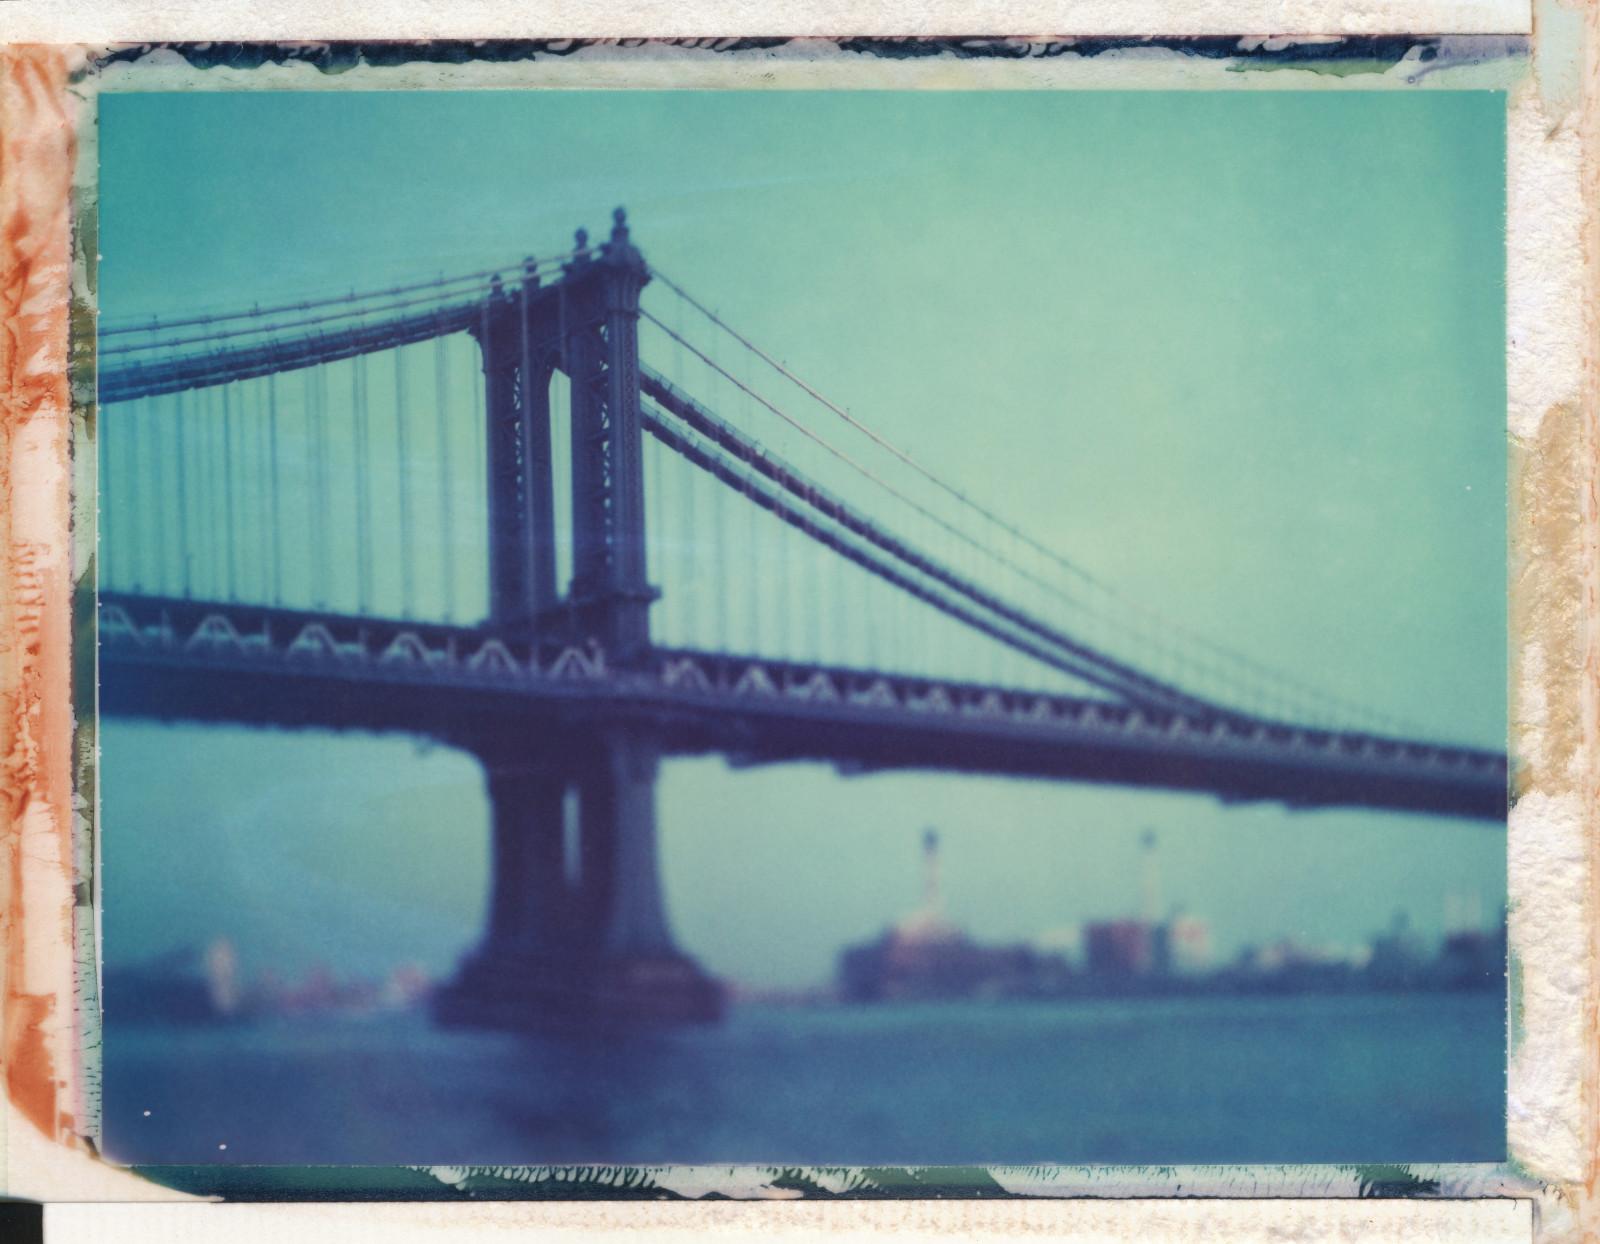 Wallpaper : nyc, newyorkcity, bridge, film, jeff, analog